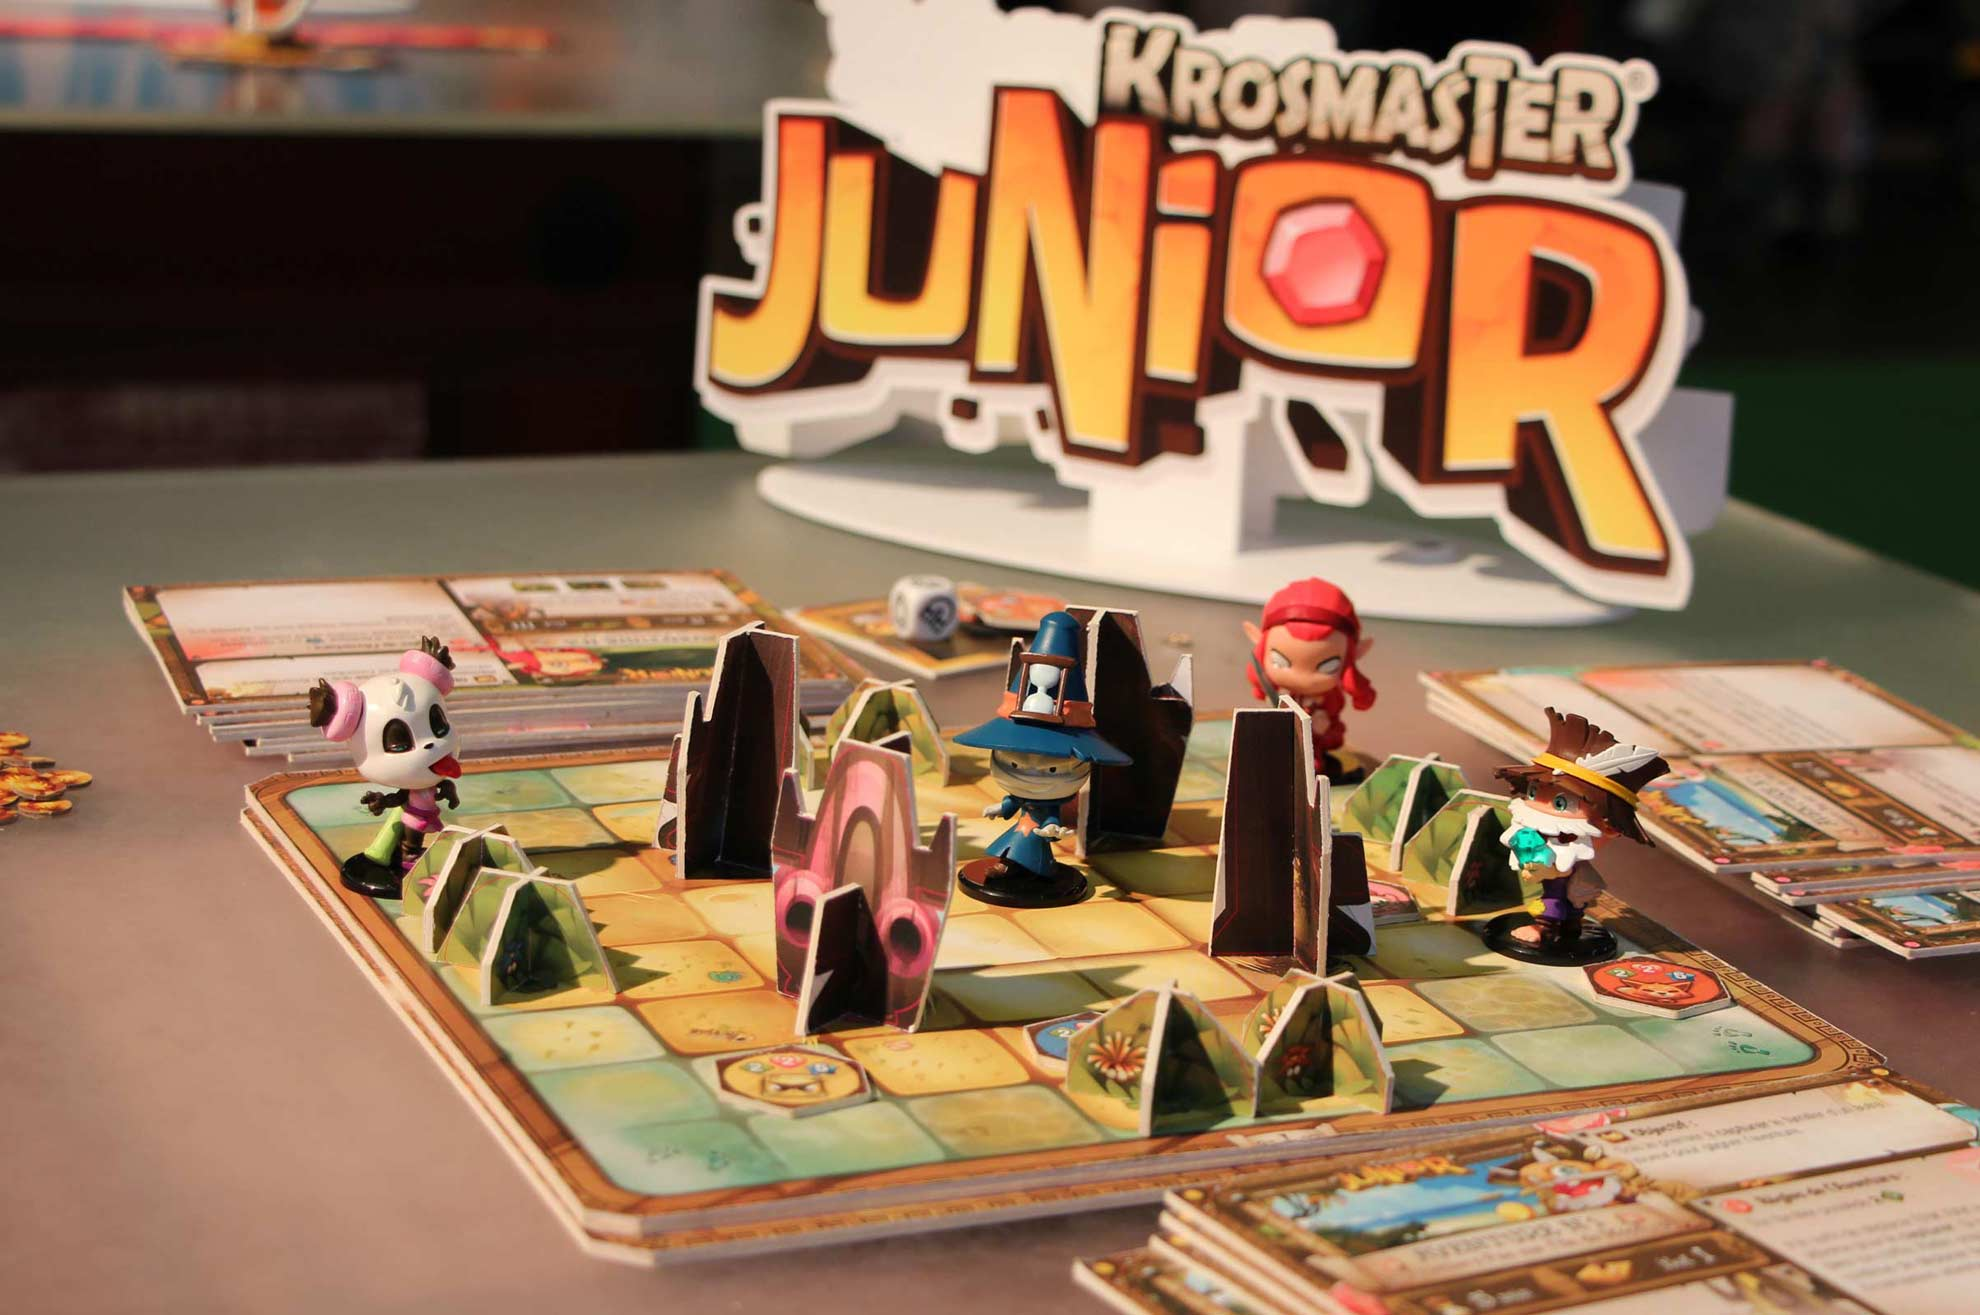 Krosmaster Junior (prototype)